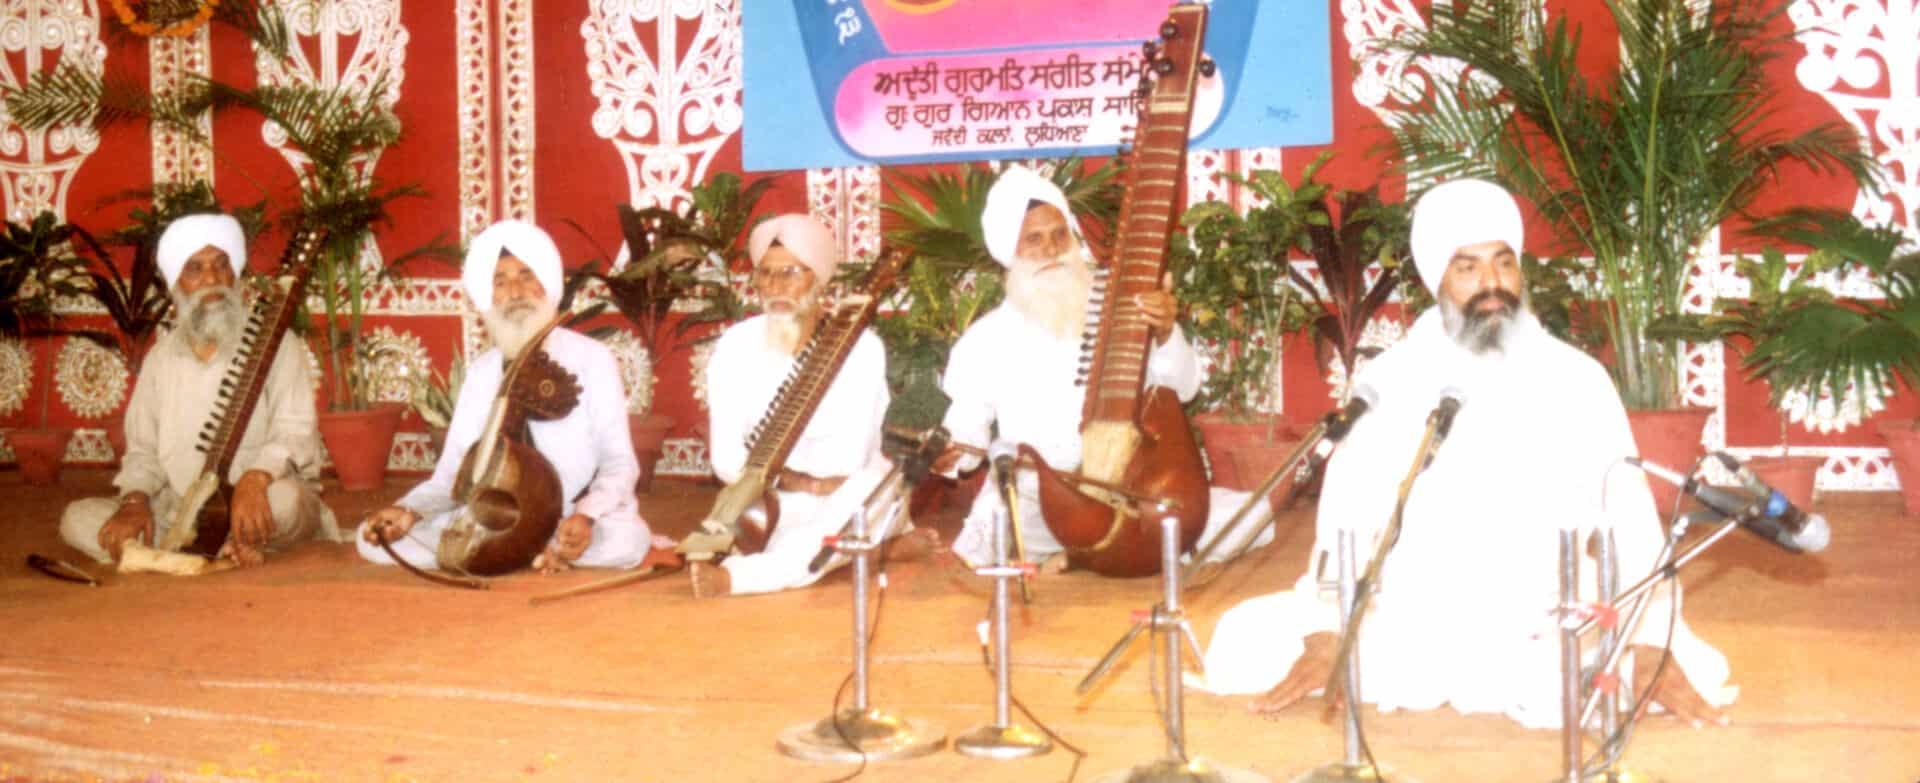 Sant Baba Sucha Singh ji